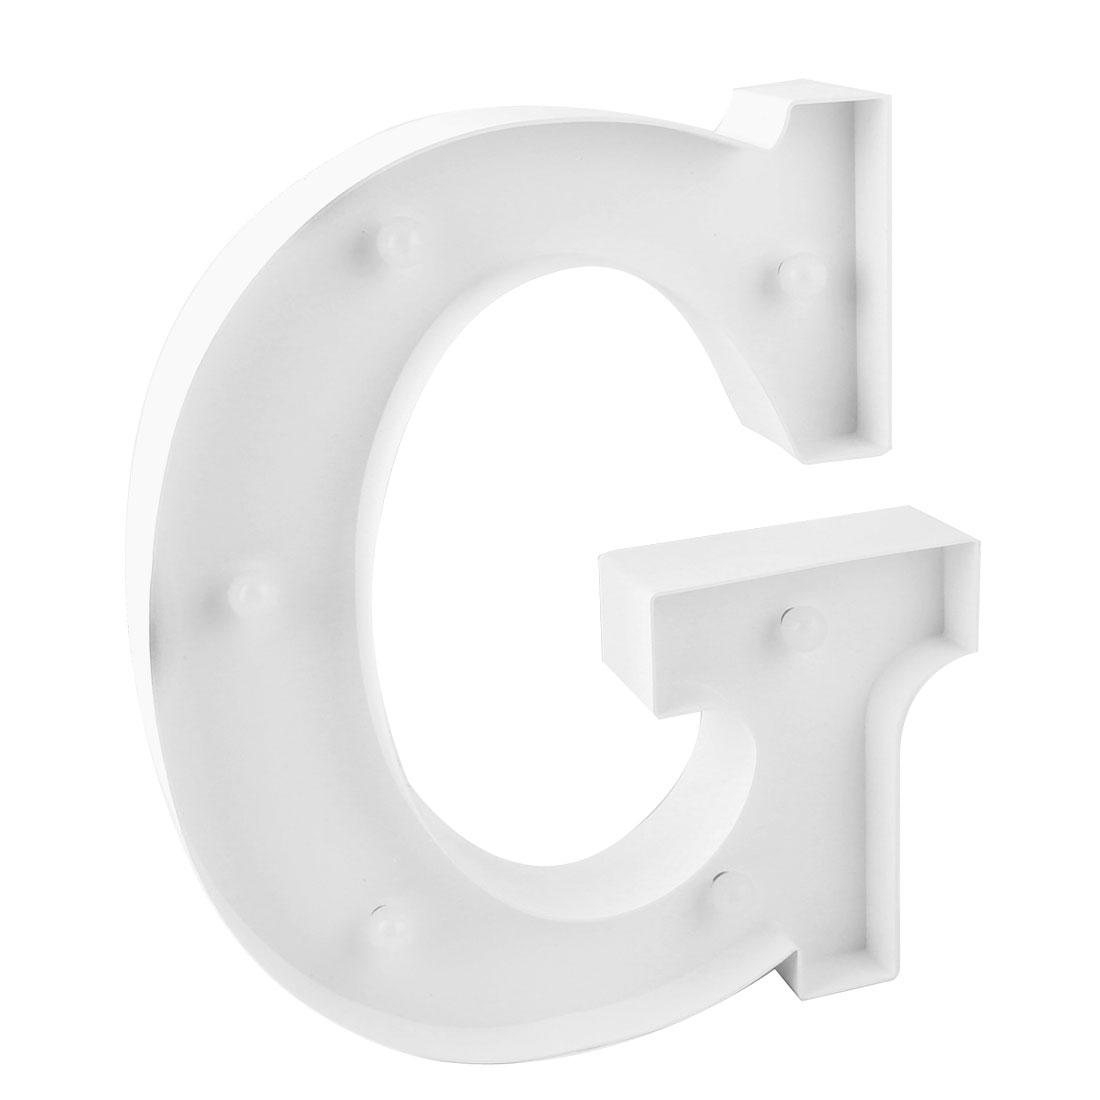 Wedding Party Plastic Decor English G Letter Alphabet Word Free DIY Hanging LED Light White